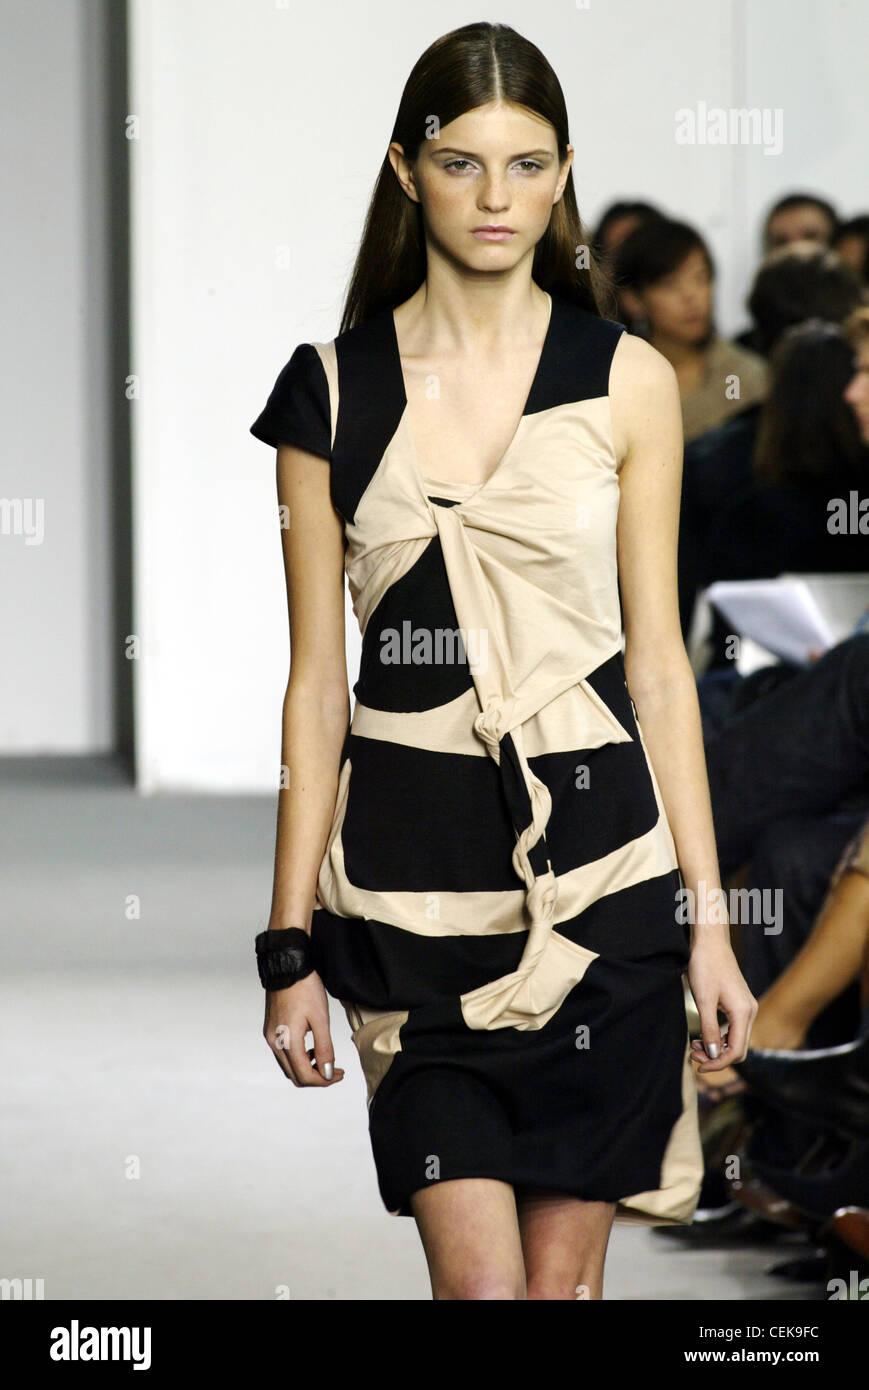 Helmut Lang Paris Ready to Wear Spring Summer Model long brunette hair tucked behind ears wearing black and beige - Stock Image